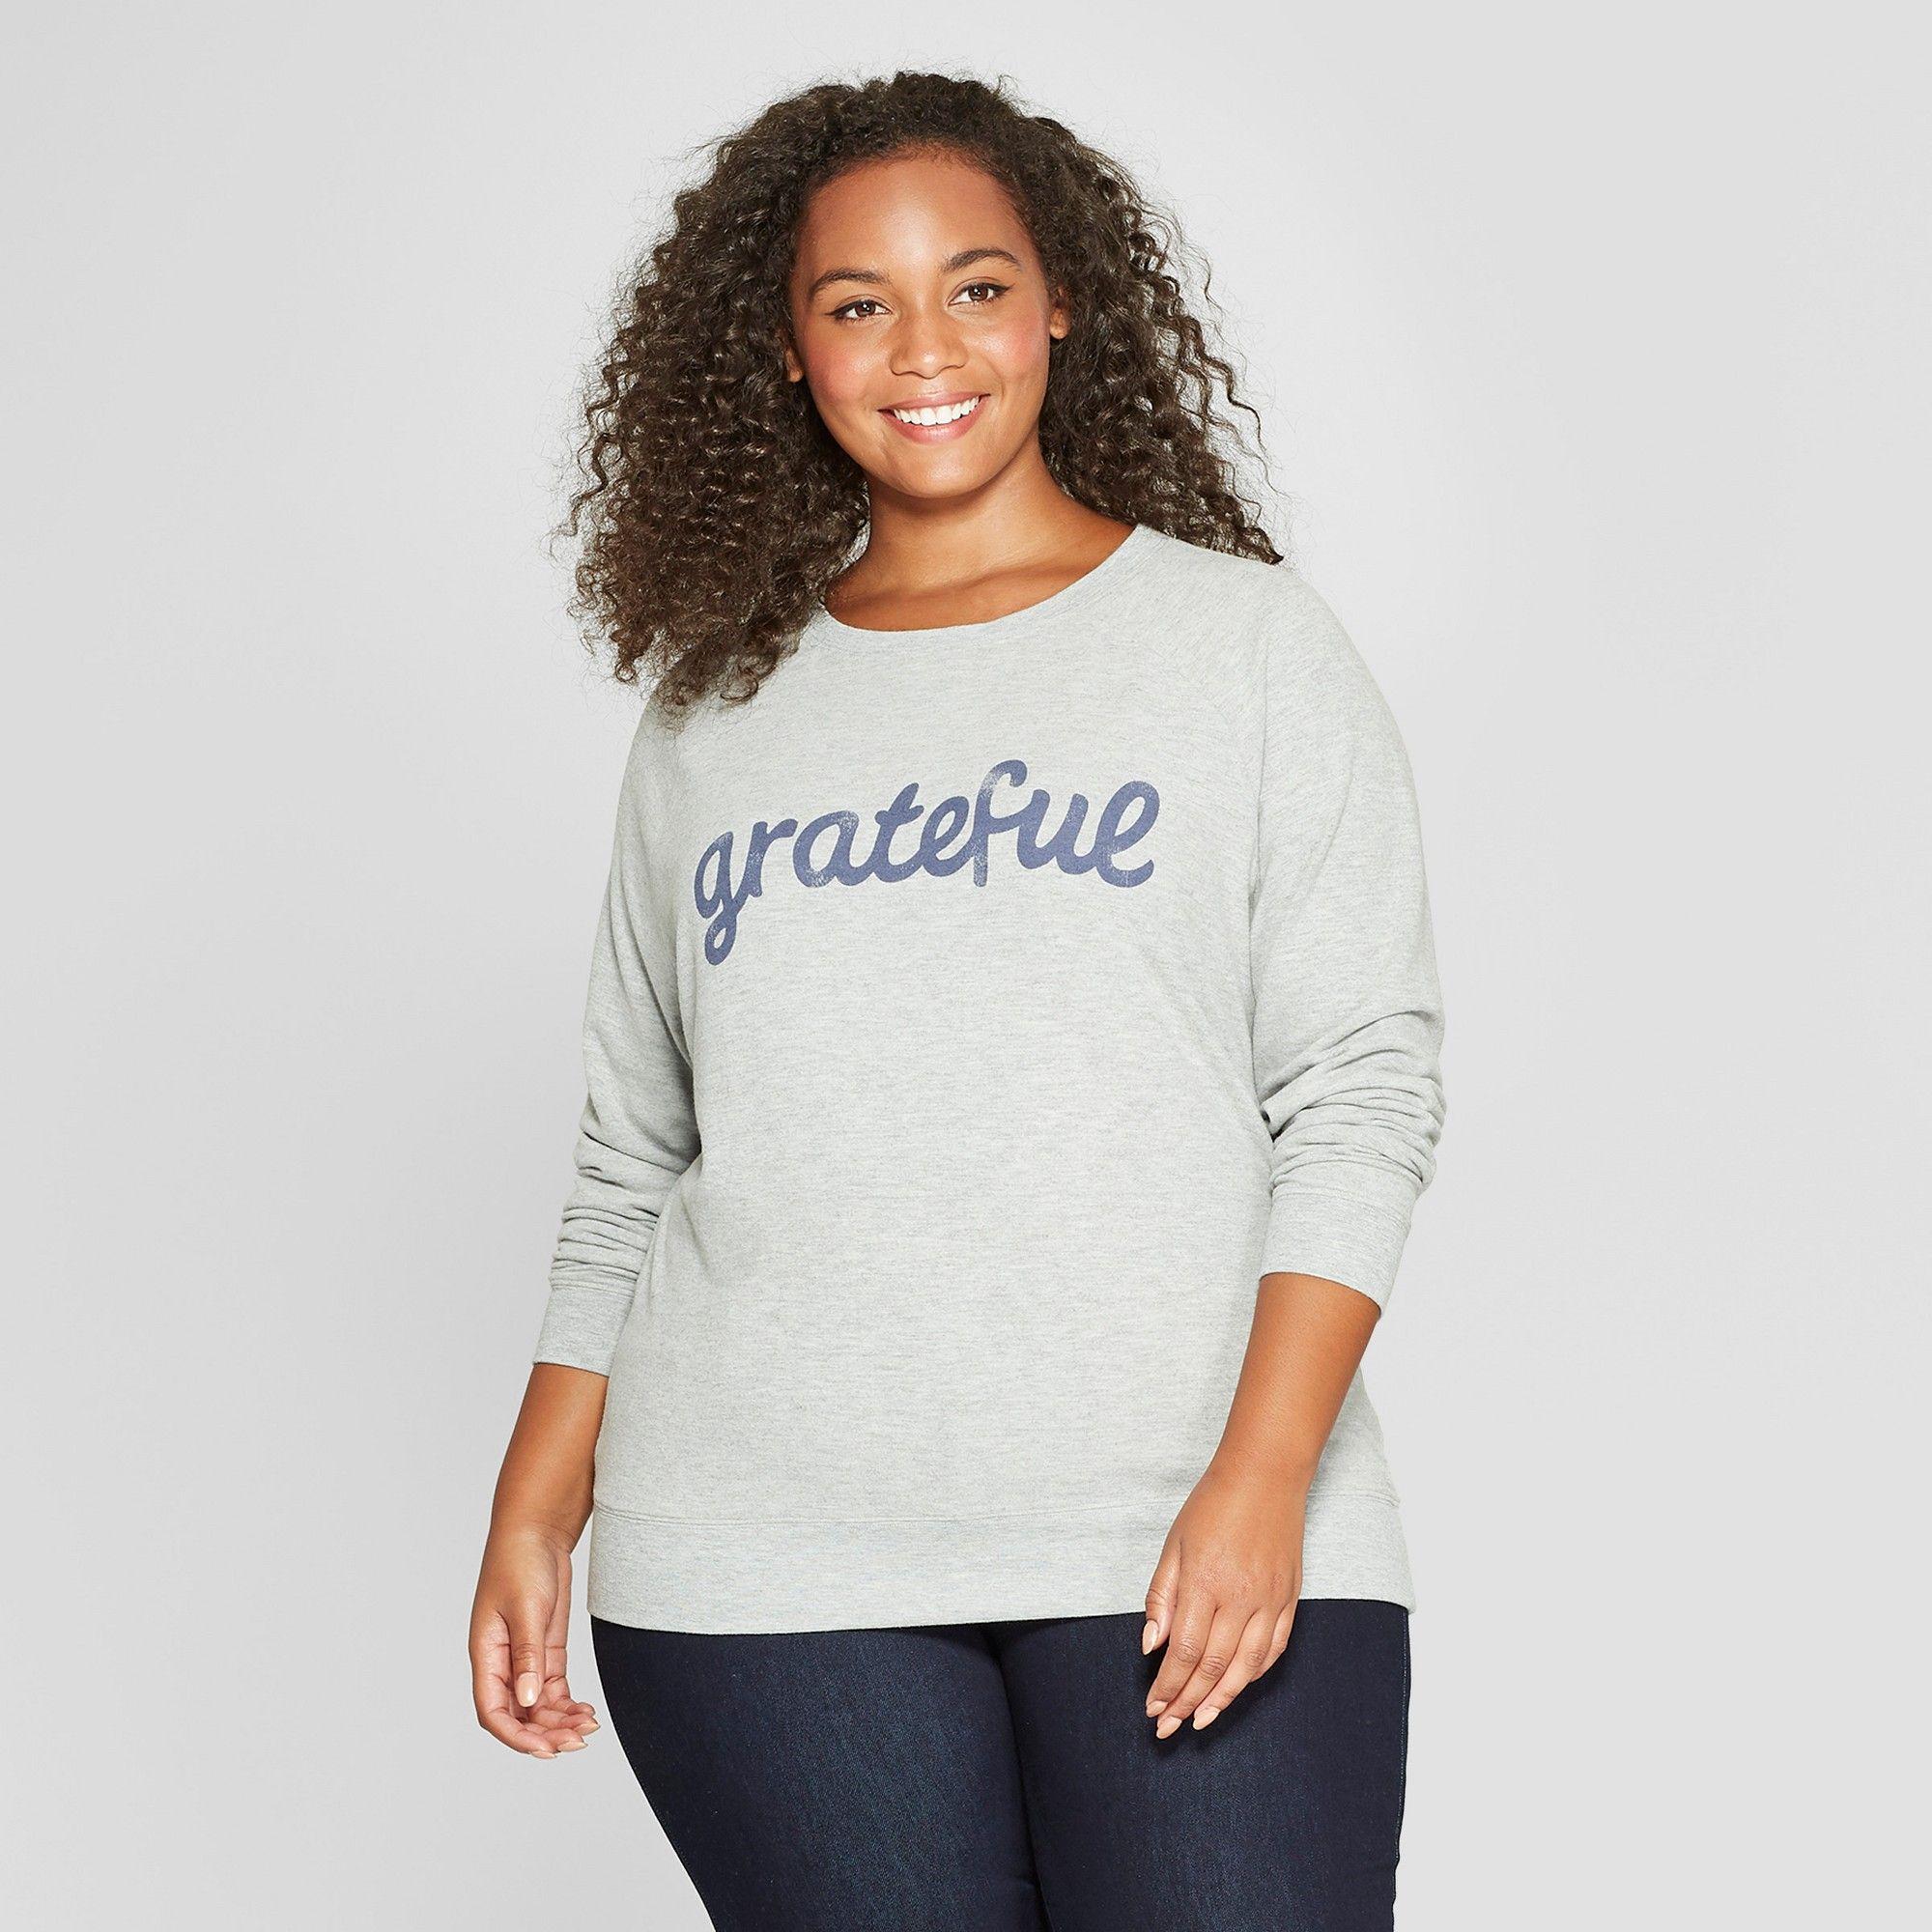 03869e7257790 Women s Plus Size Grateful Graphic Sweatshirt - Grayson Threads (Juniors )  Heather ...